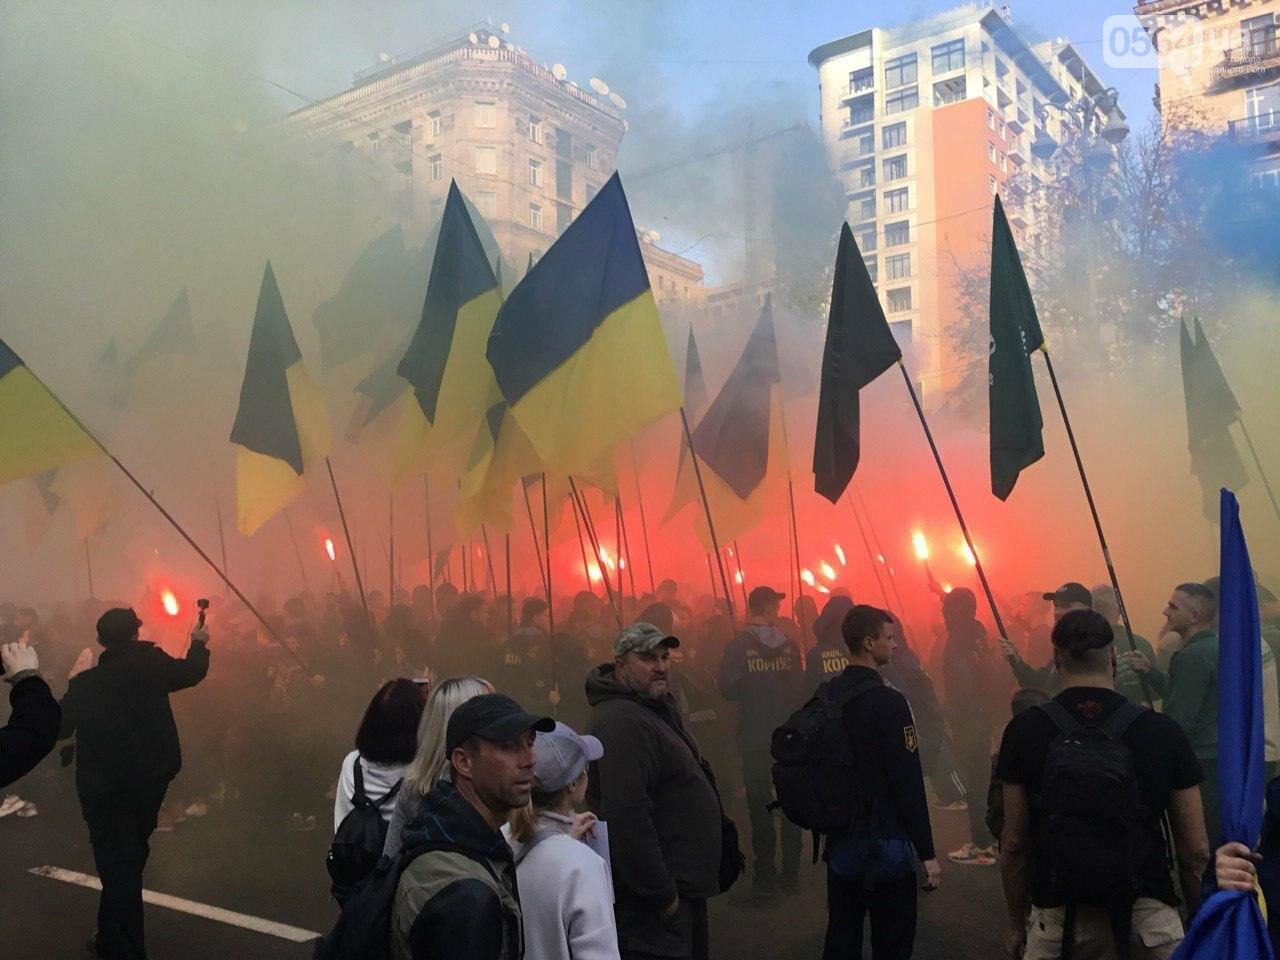 Криворожане поддержали Марш сопротивления капитуляции в Киеве, - ФОТО, ВИДЕО, ОБНОВЛЕНО, фото-4